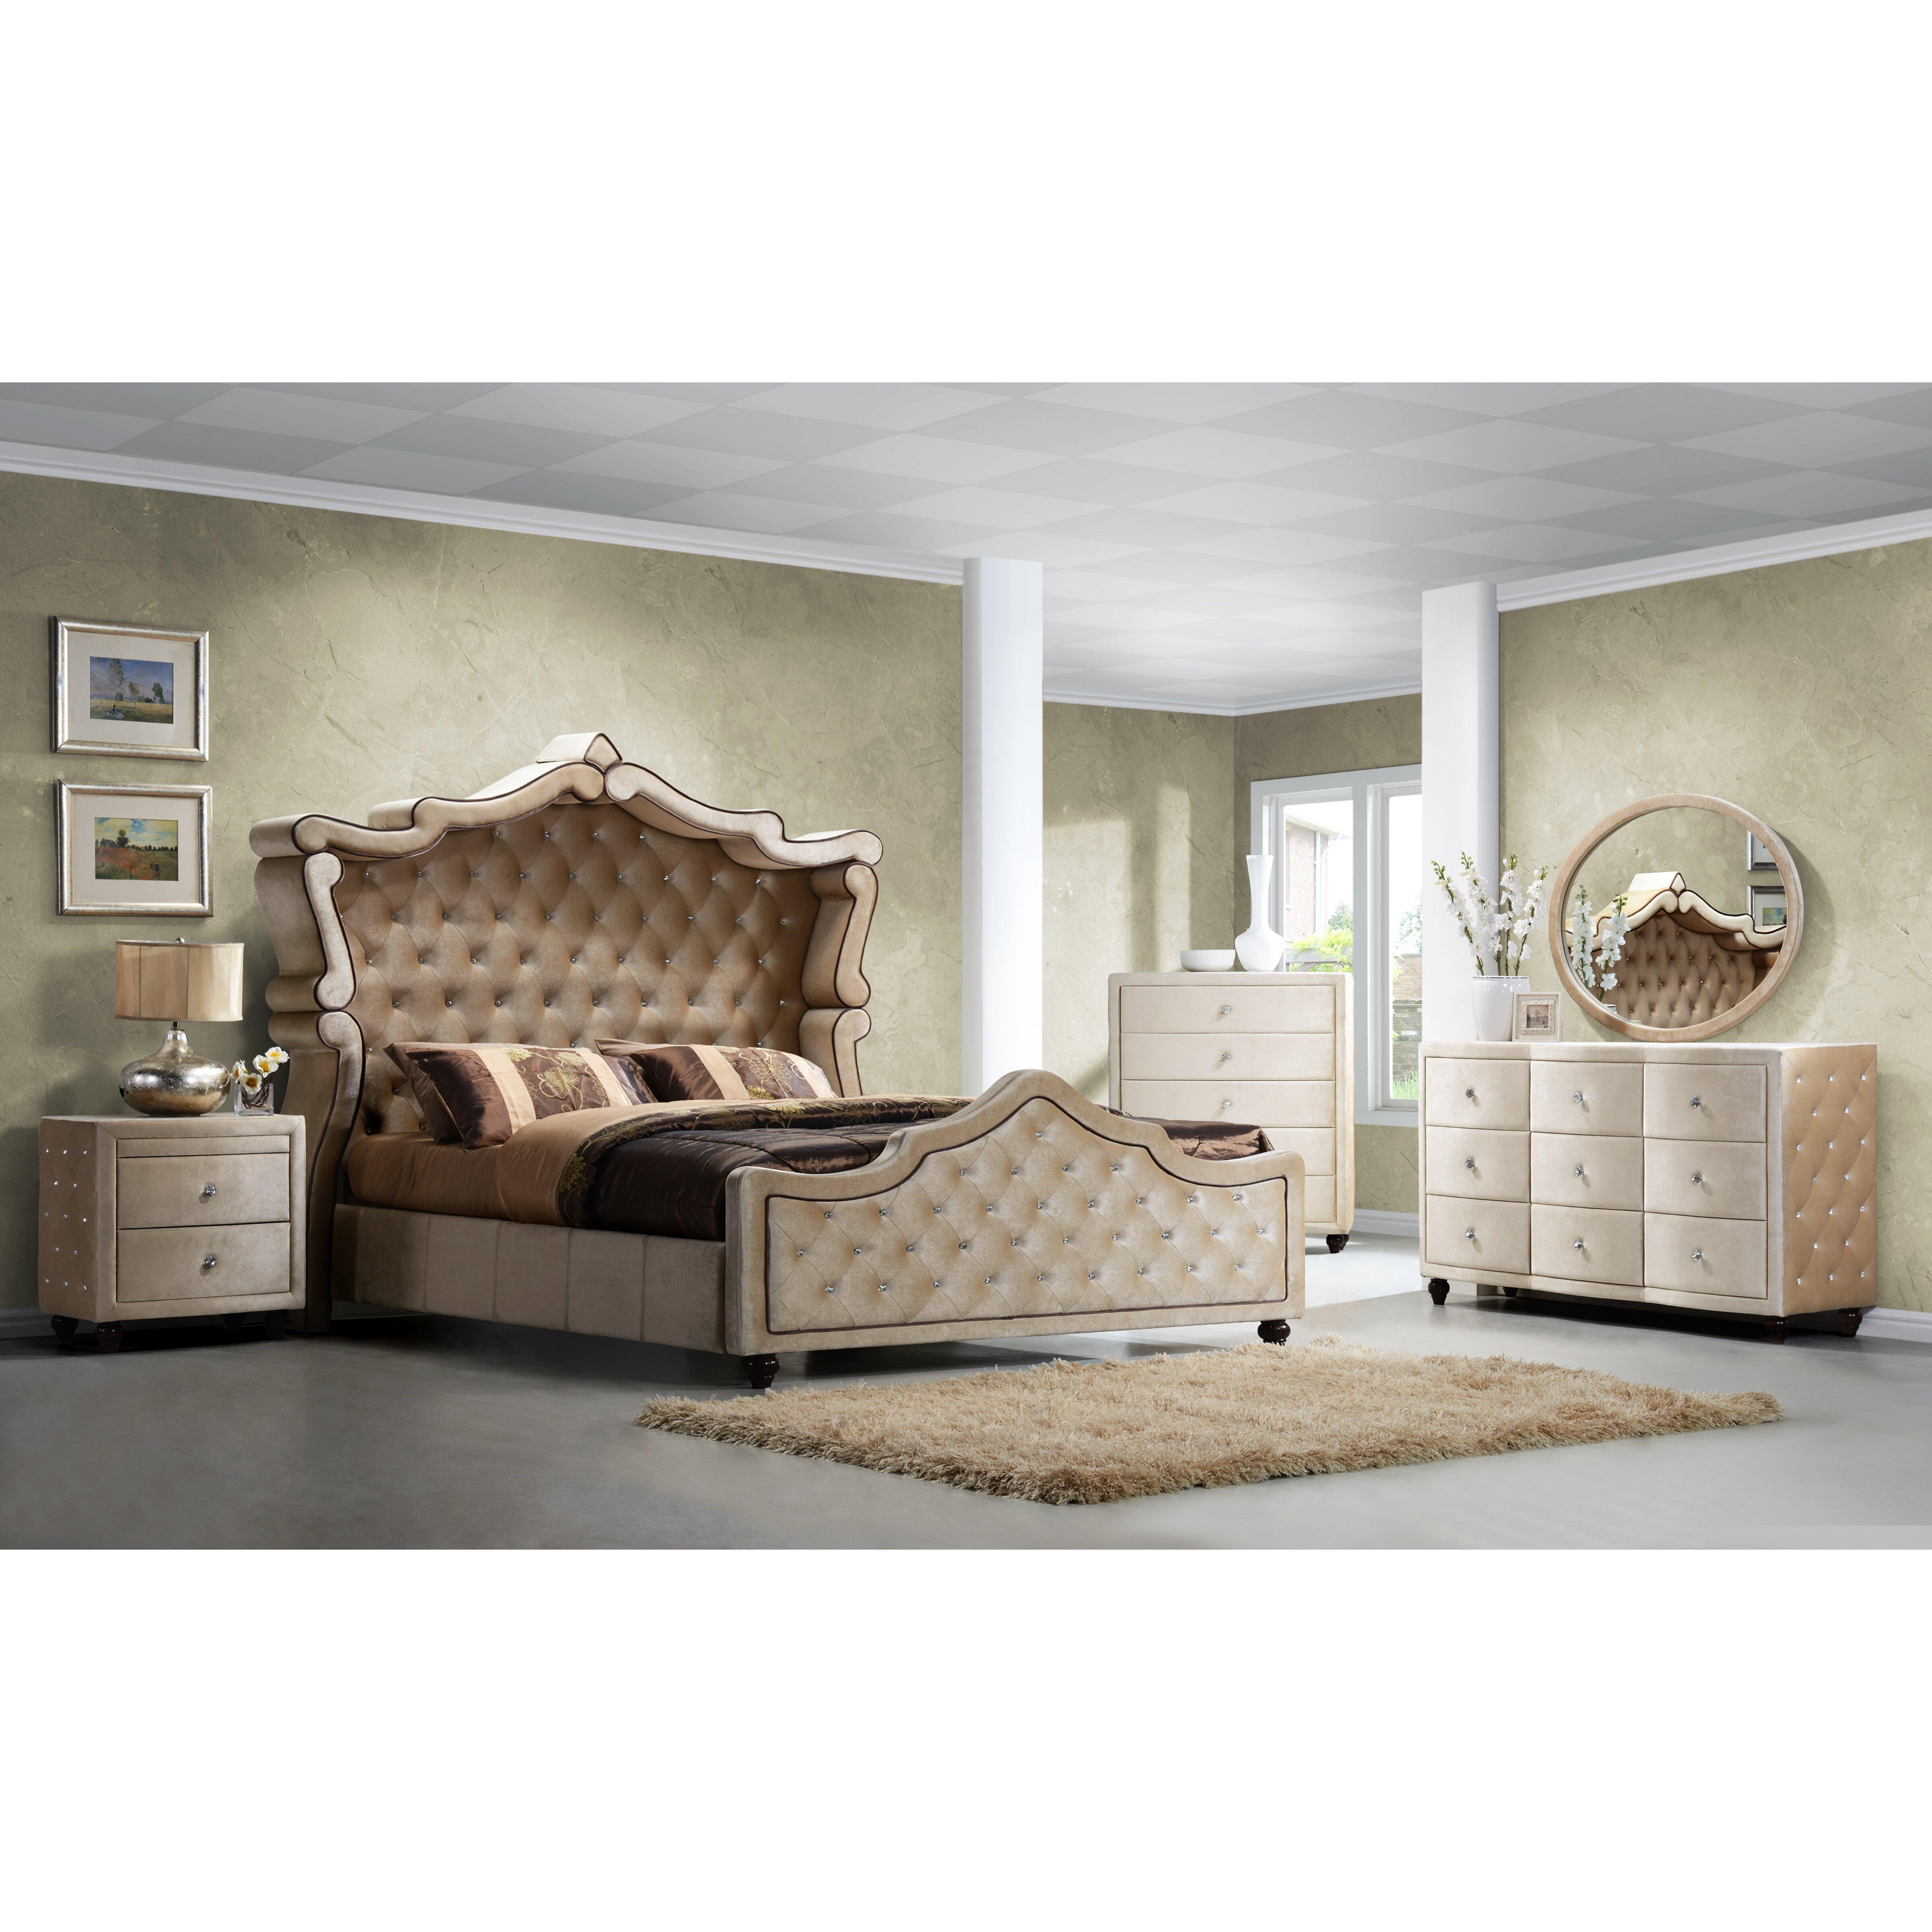 Furniture Bedroom Set > PierPointSprings.com